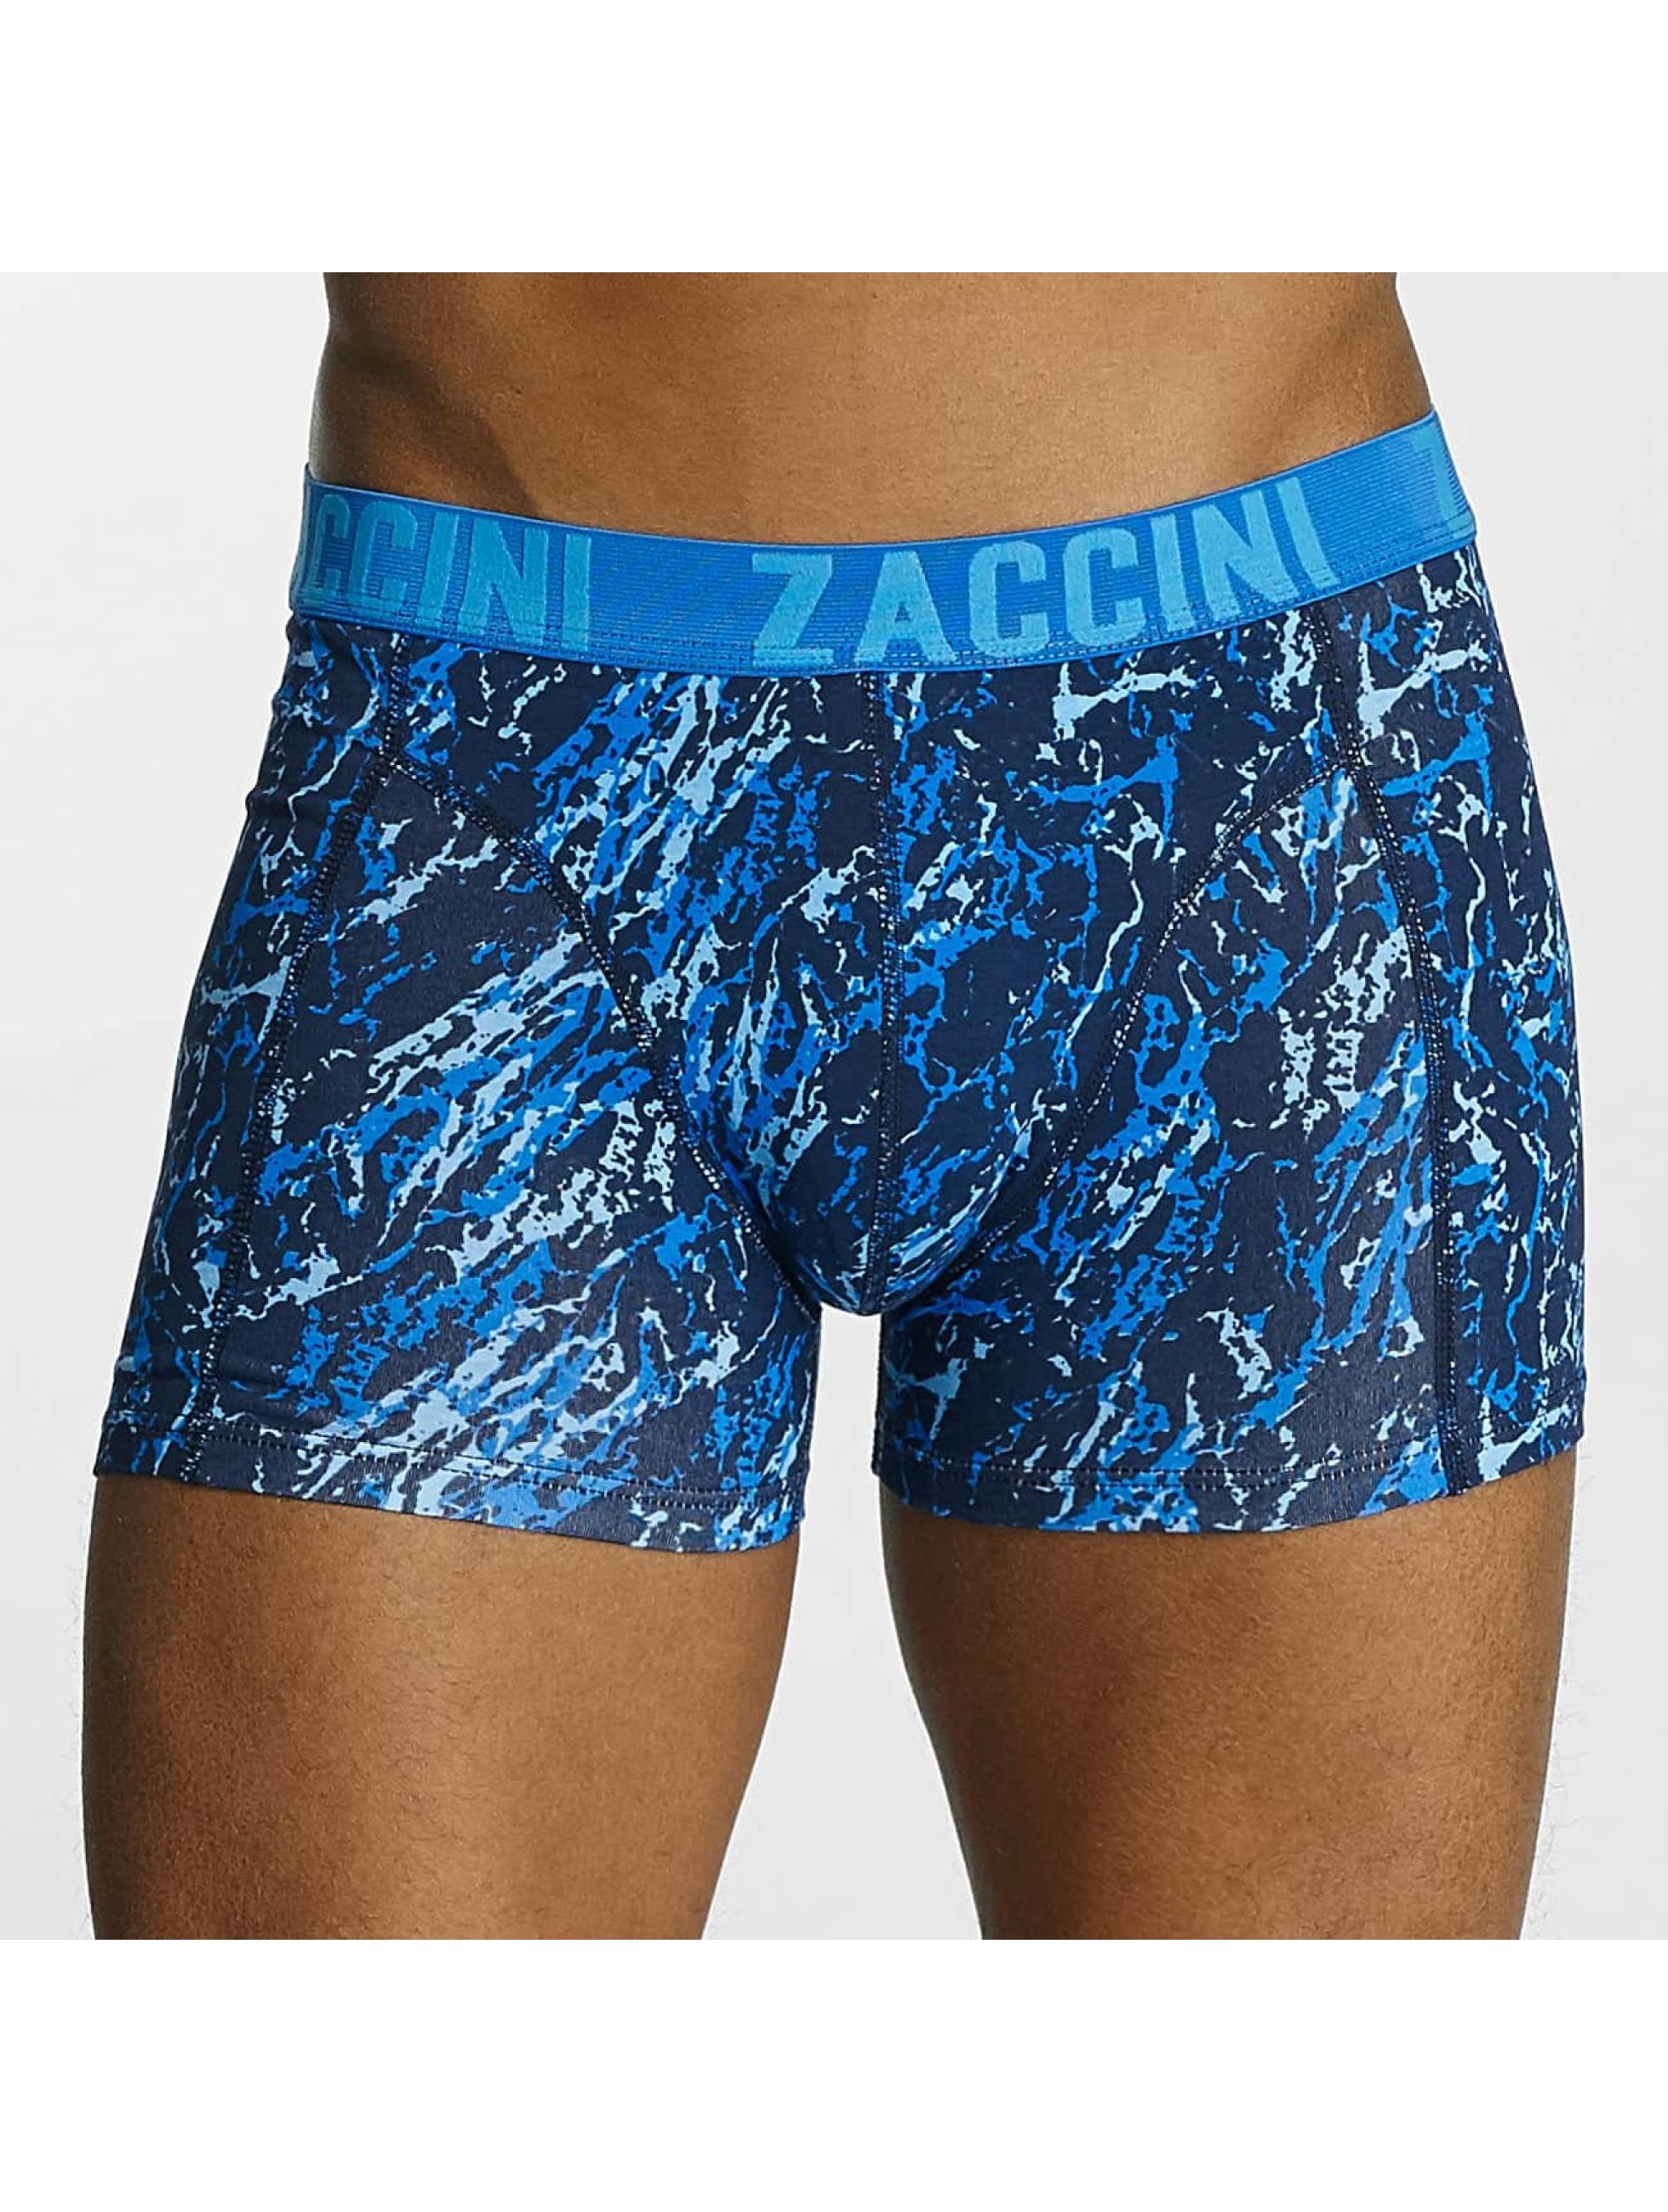 Zaccini boxershorts Mineral blauw